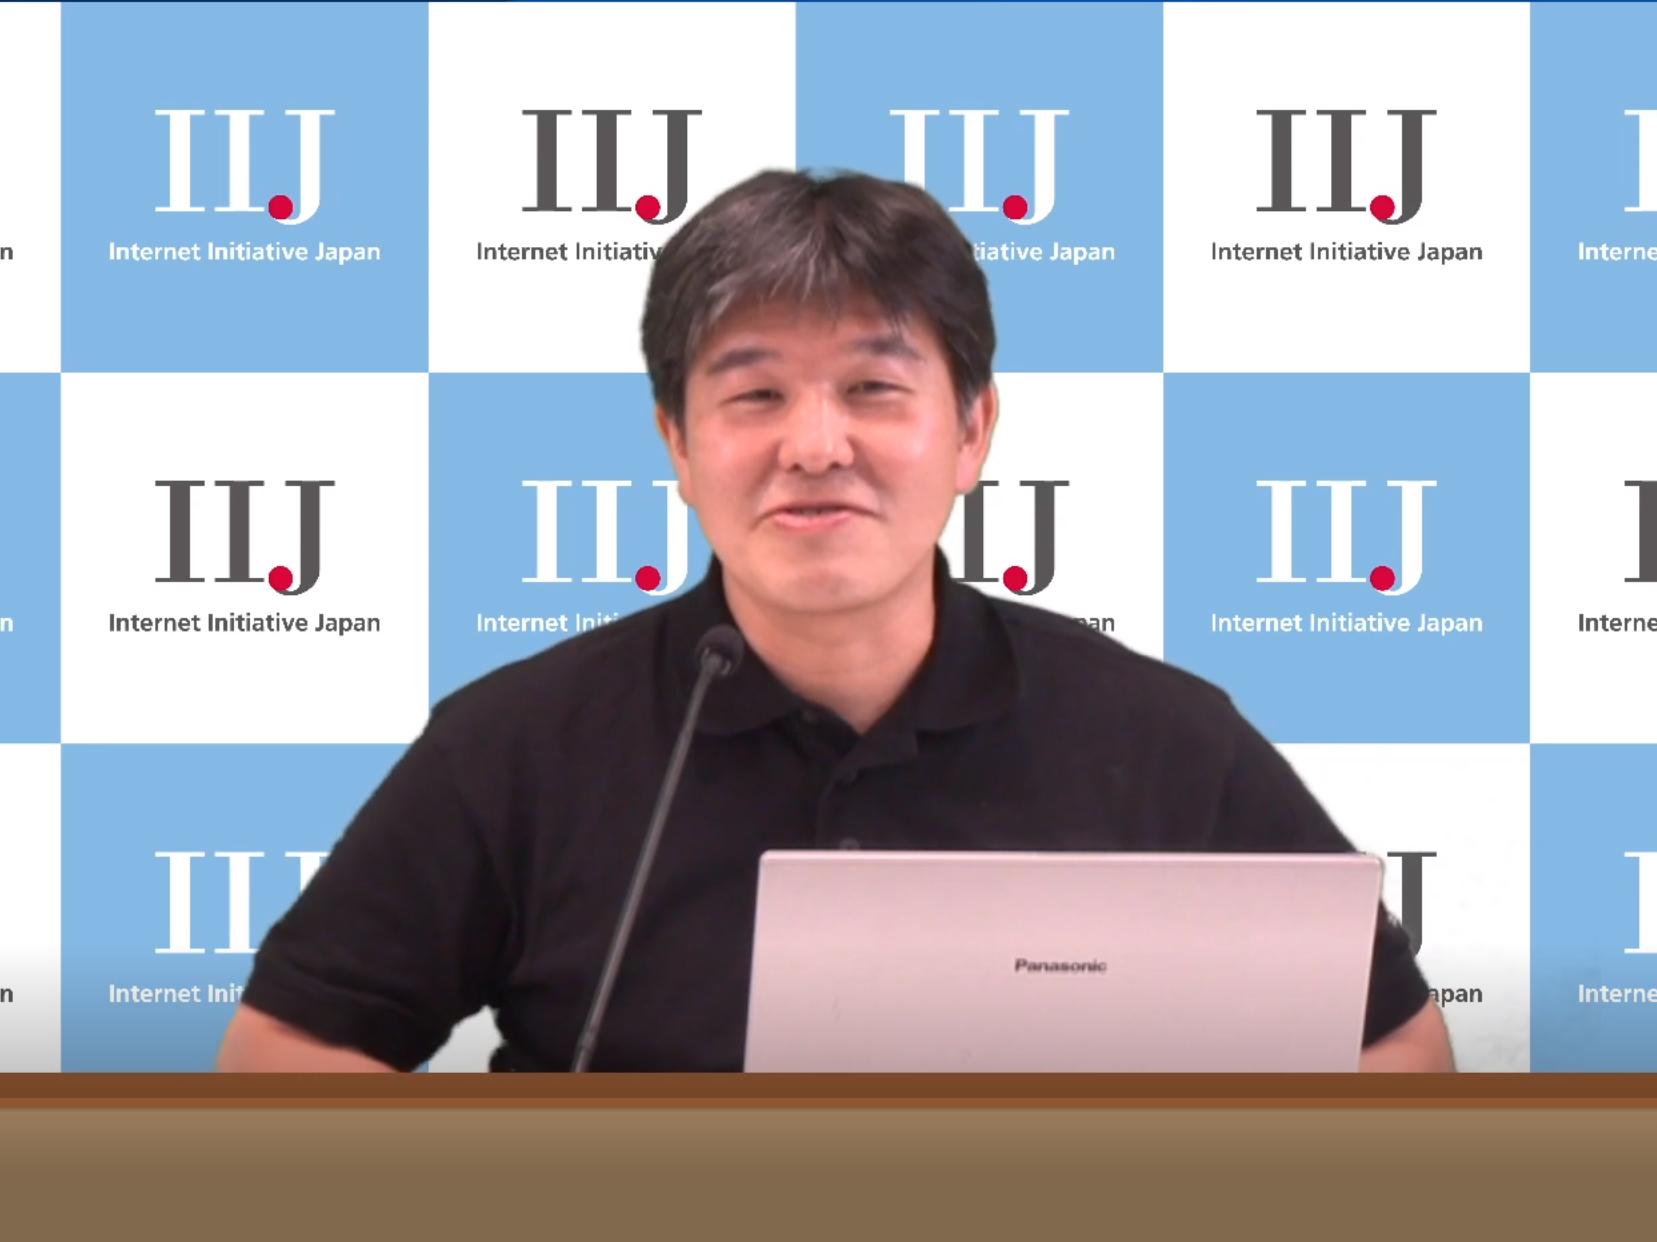 IIJの基盤エンジニアリング本部 運用技術部 技術開発課の松崎吉伸氏